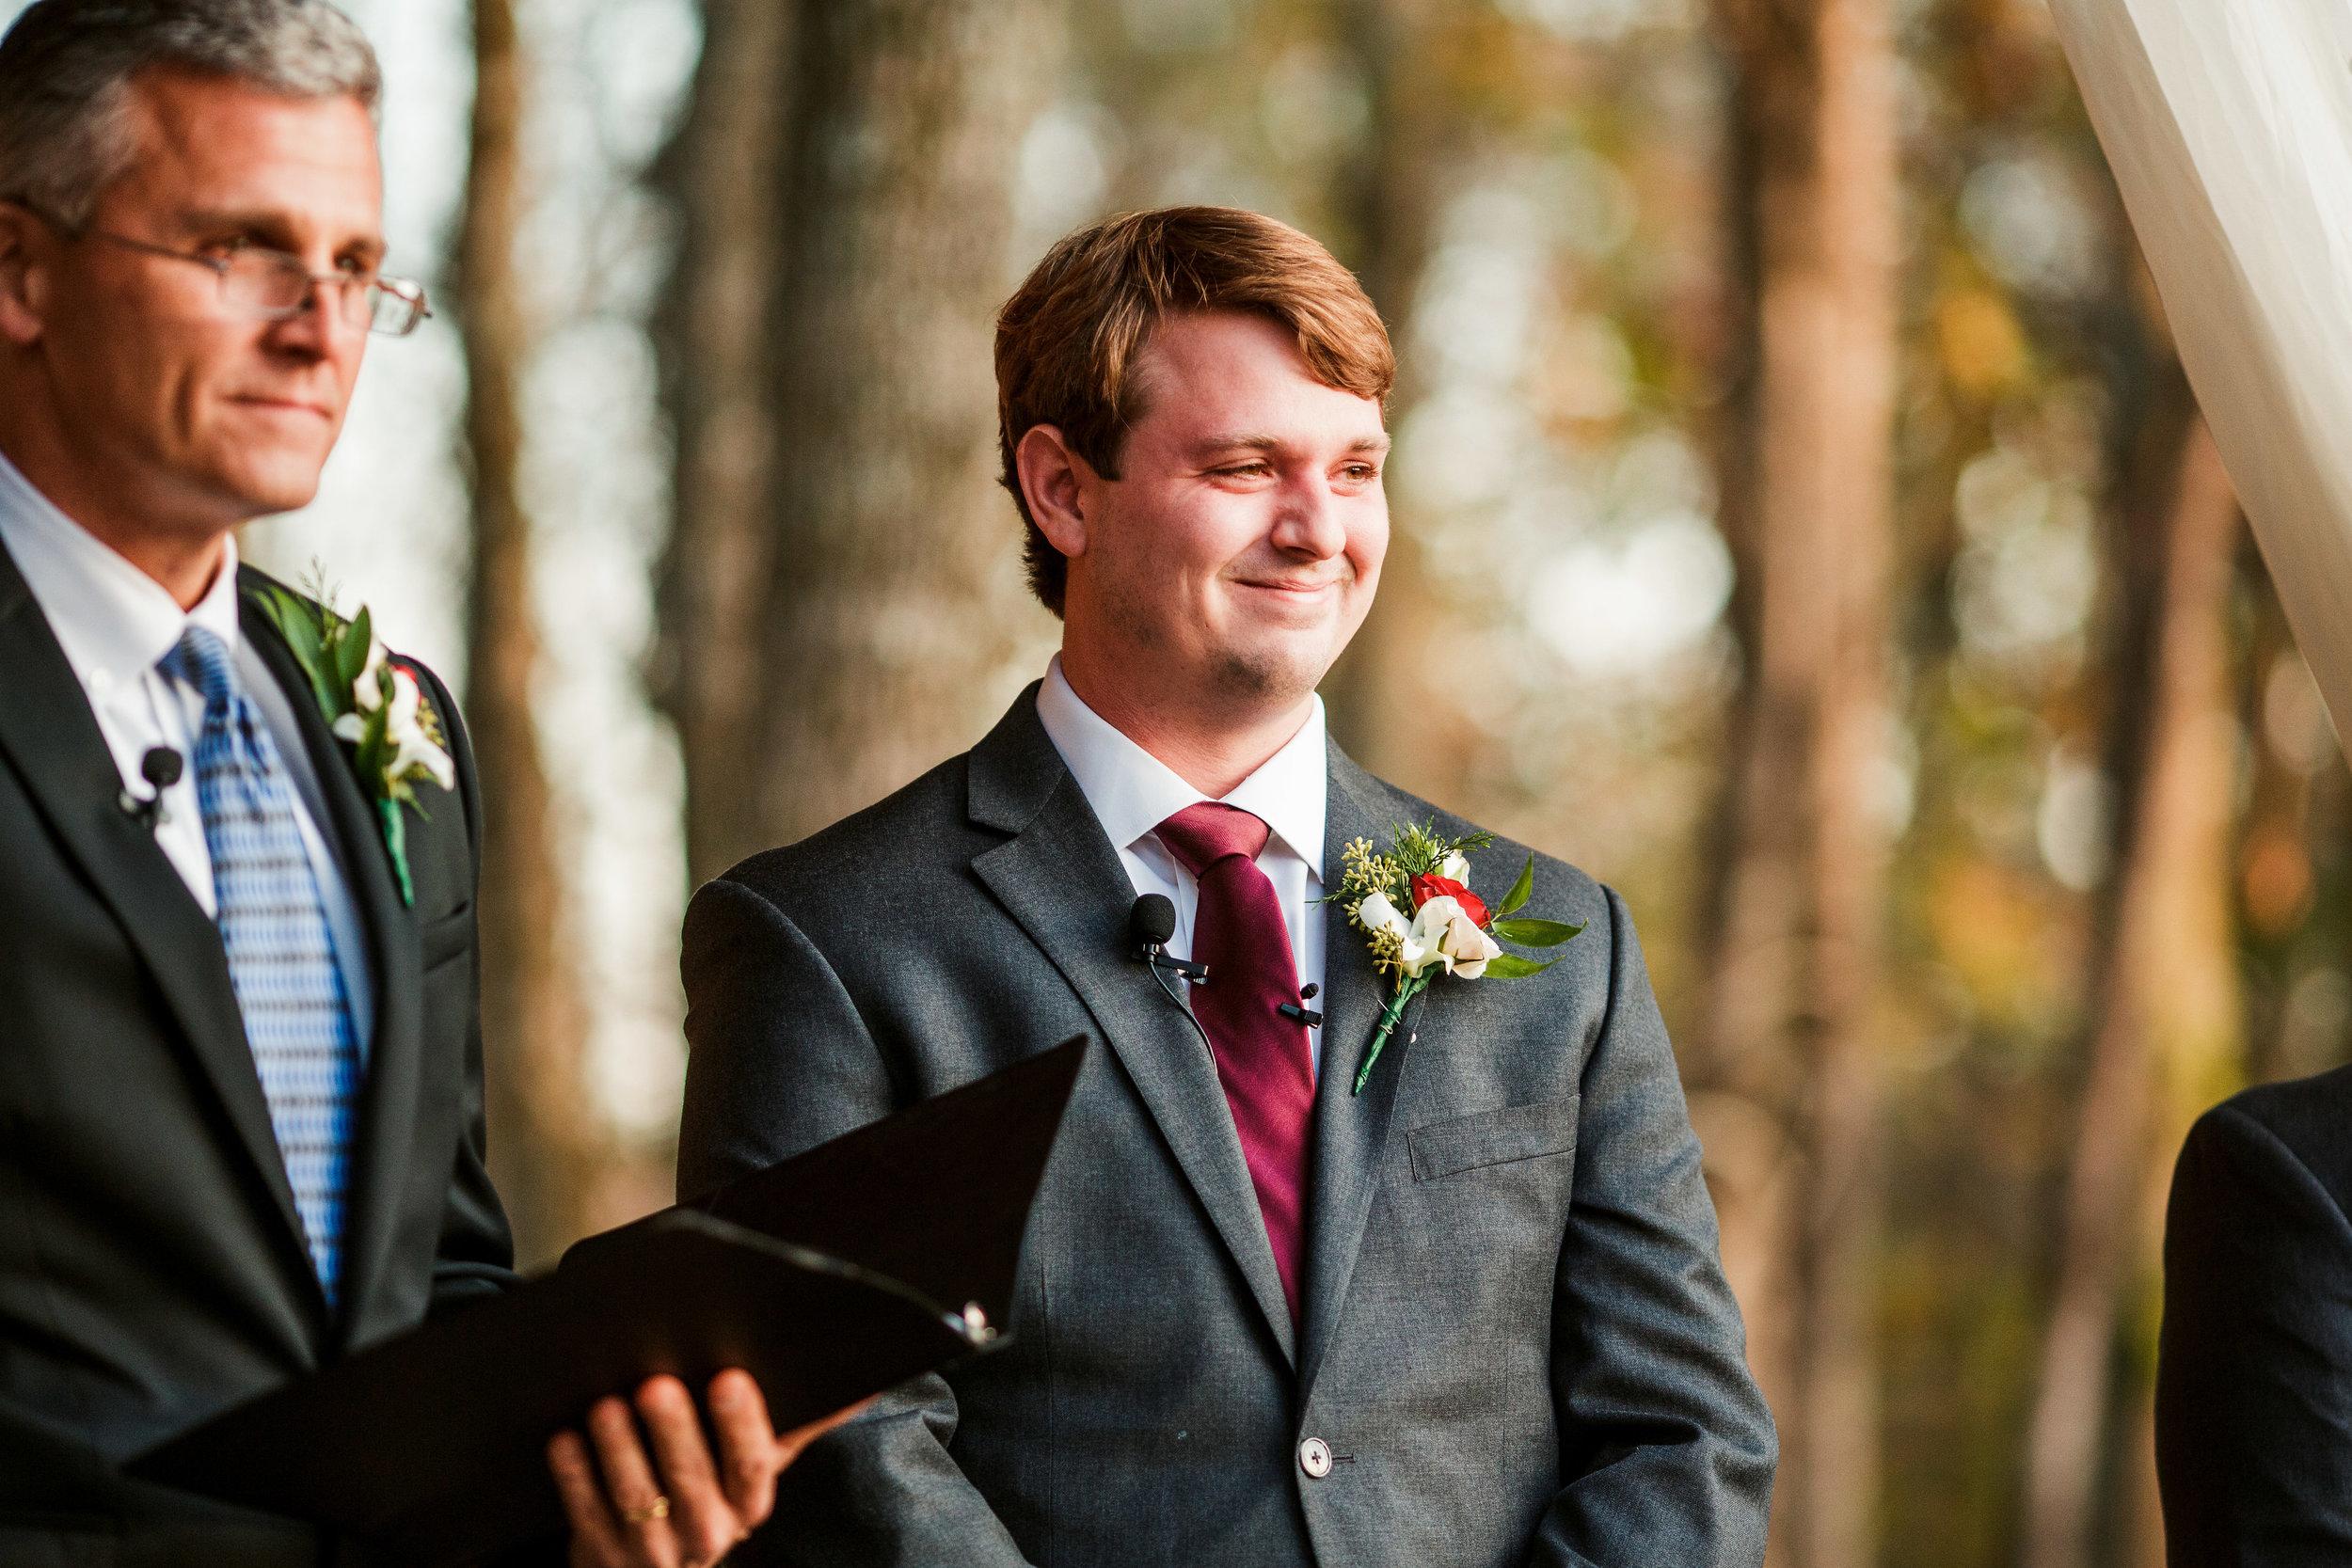 Saddle-Woods-Farm-Wedding 34.jpg